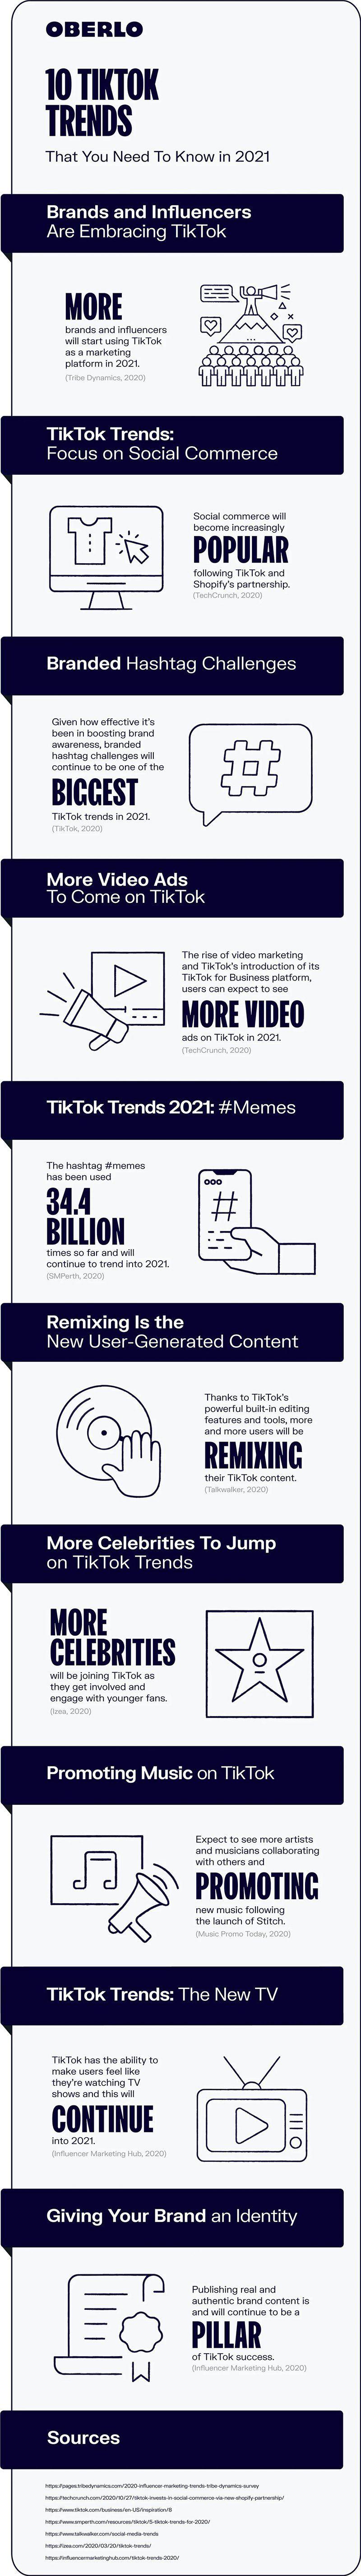 10 Tiktok Trends To Guide Your Social Media Strategy In 2021 Infographic Social Media Today Social Media Strategies Social Media Social Media Infographic